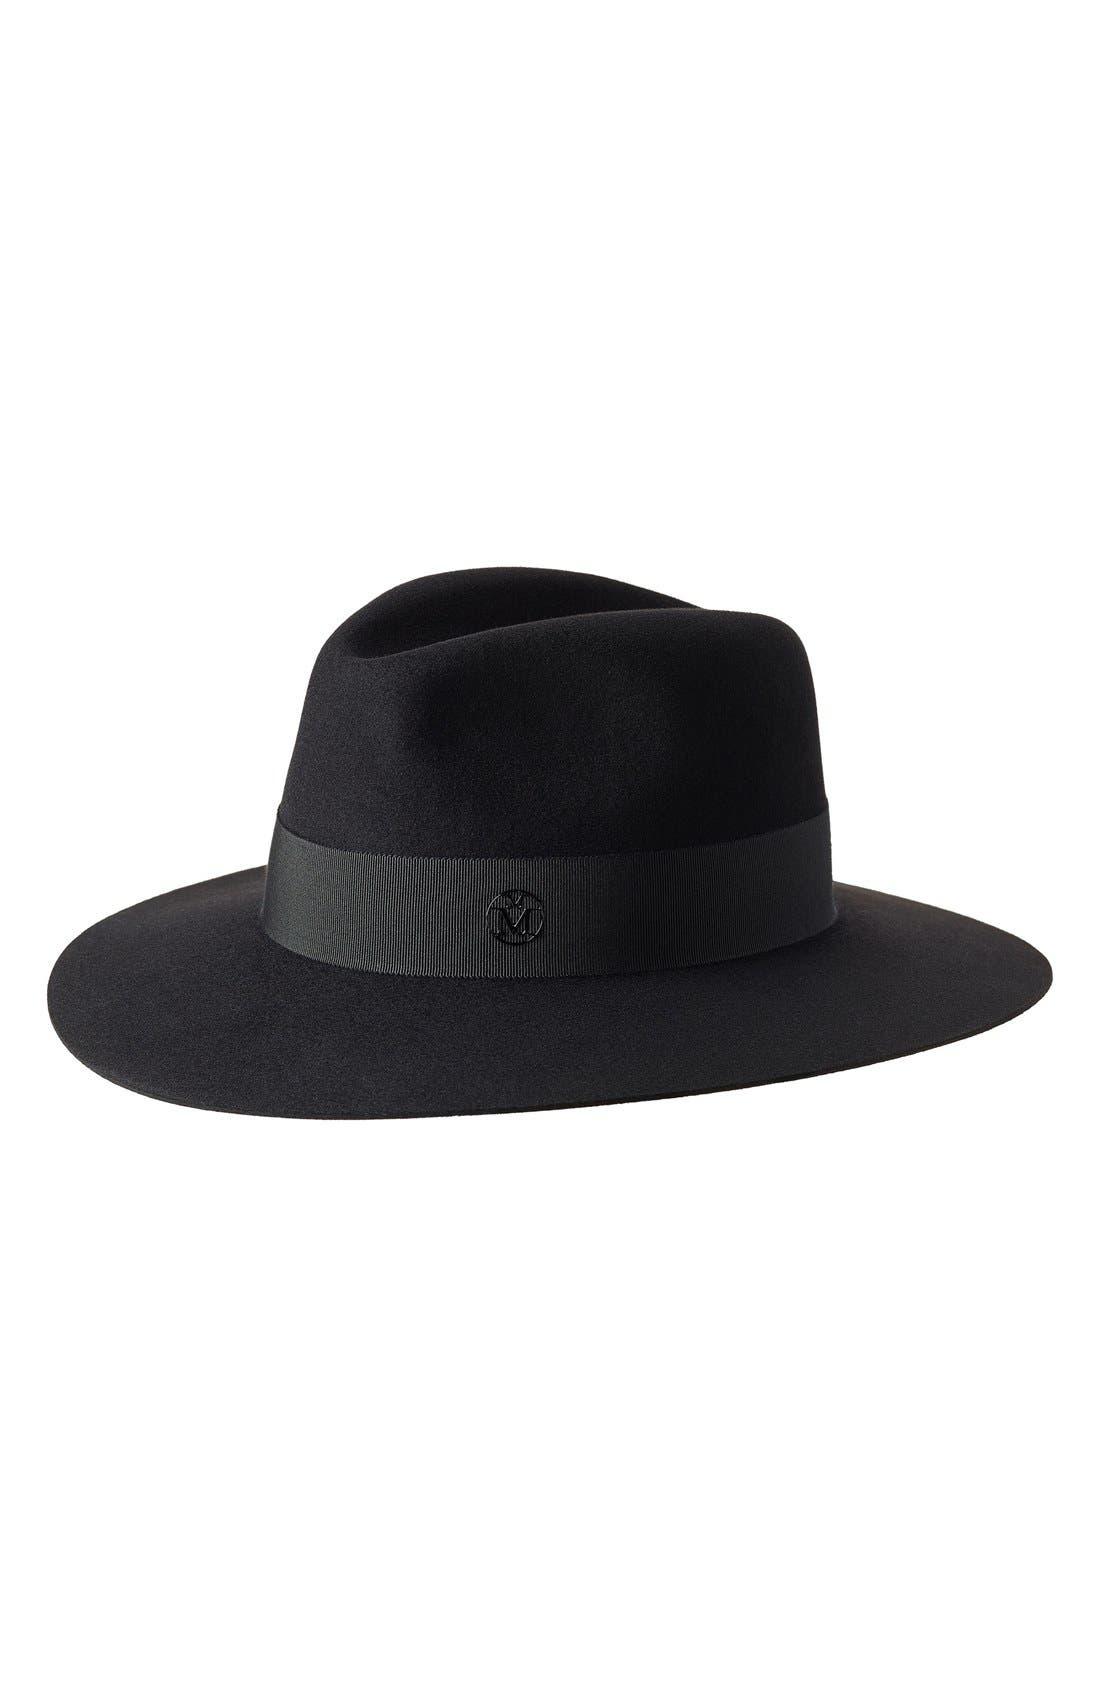 Henrietta Fur Felt Hat,                             Main thumbnail 1, color,                             001